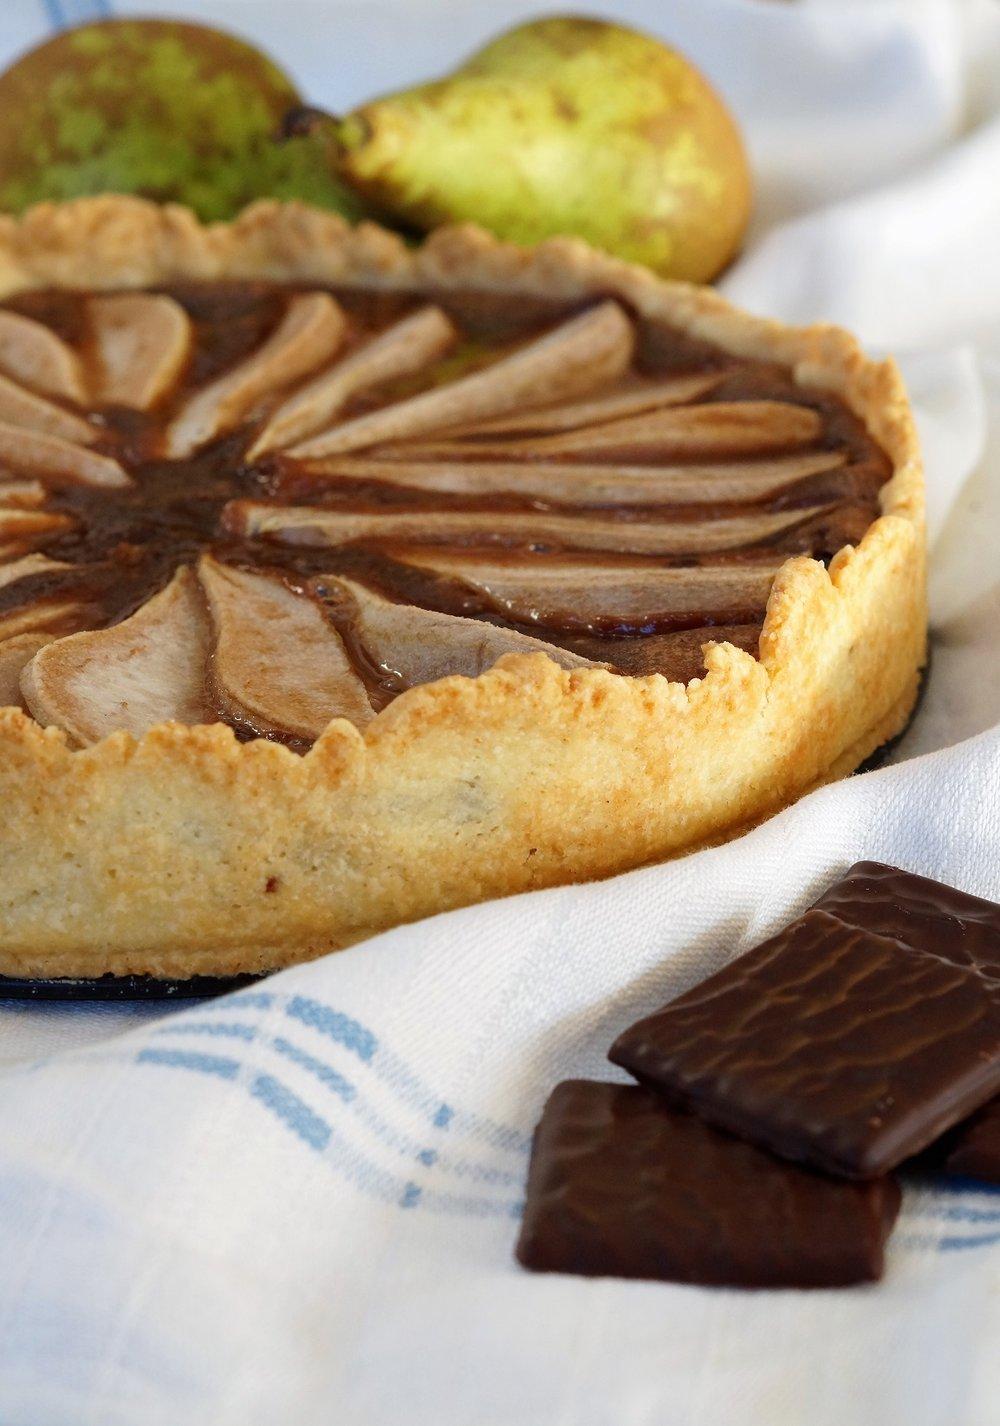 Sjokoladepai med pære og after eight